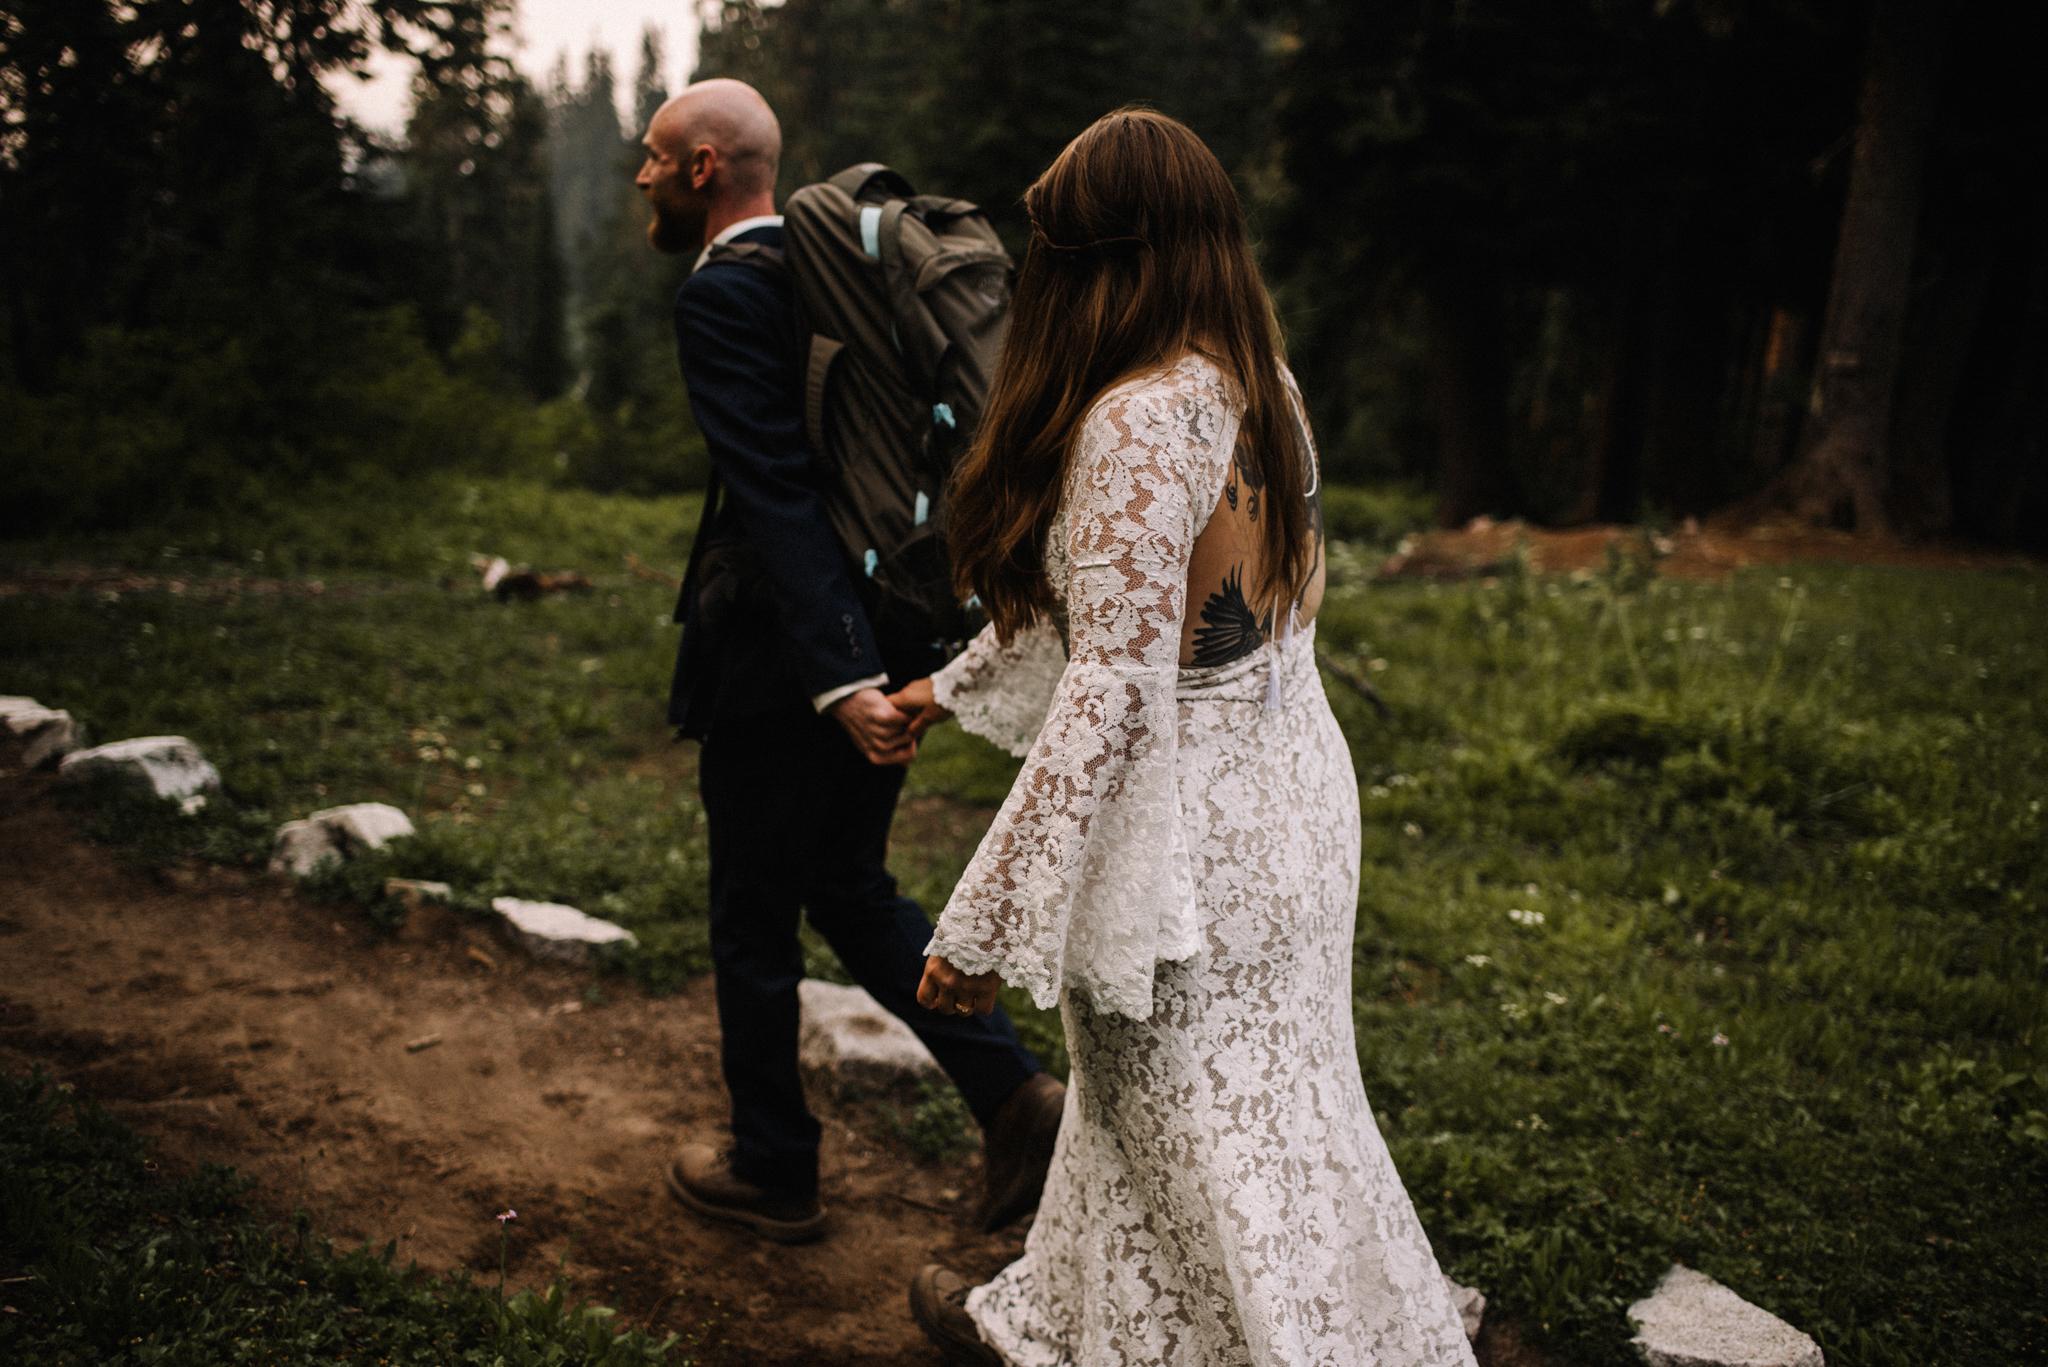 White Sails Creative Backyard Wedding Guide  Inspiration_5.JPG